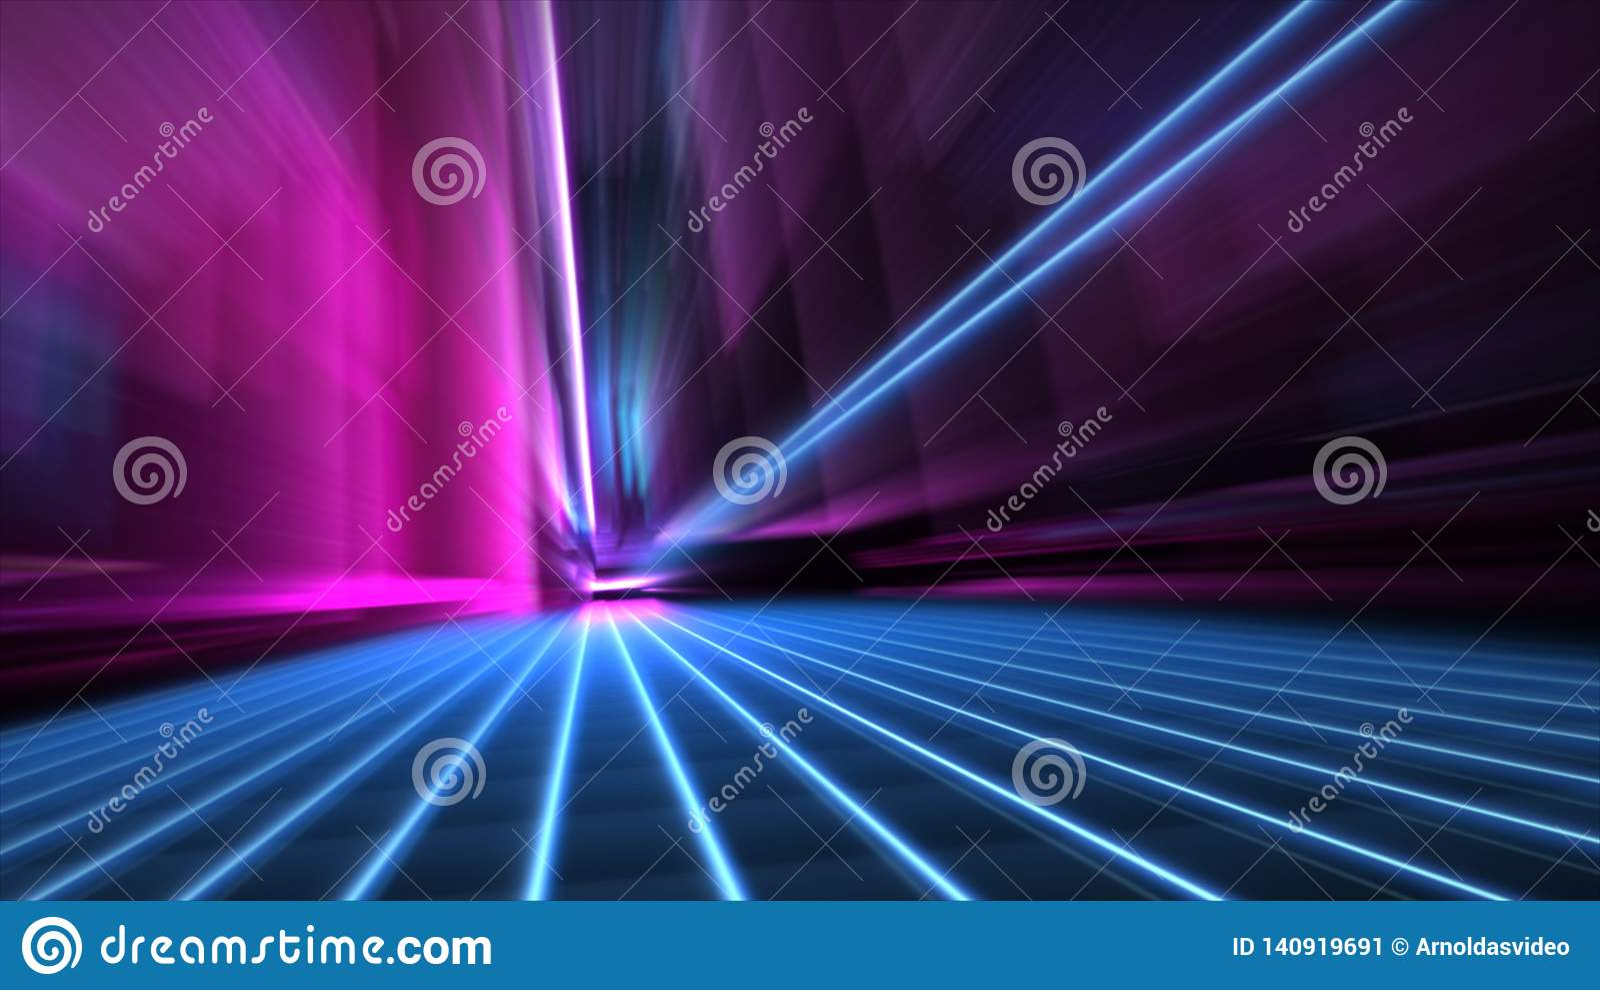 A velocidade do sumário borrou a rua de néon azul e cor-de-rosa de 80s do estilo da cidade no papel de parede da noite 4k